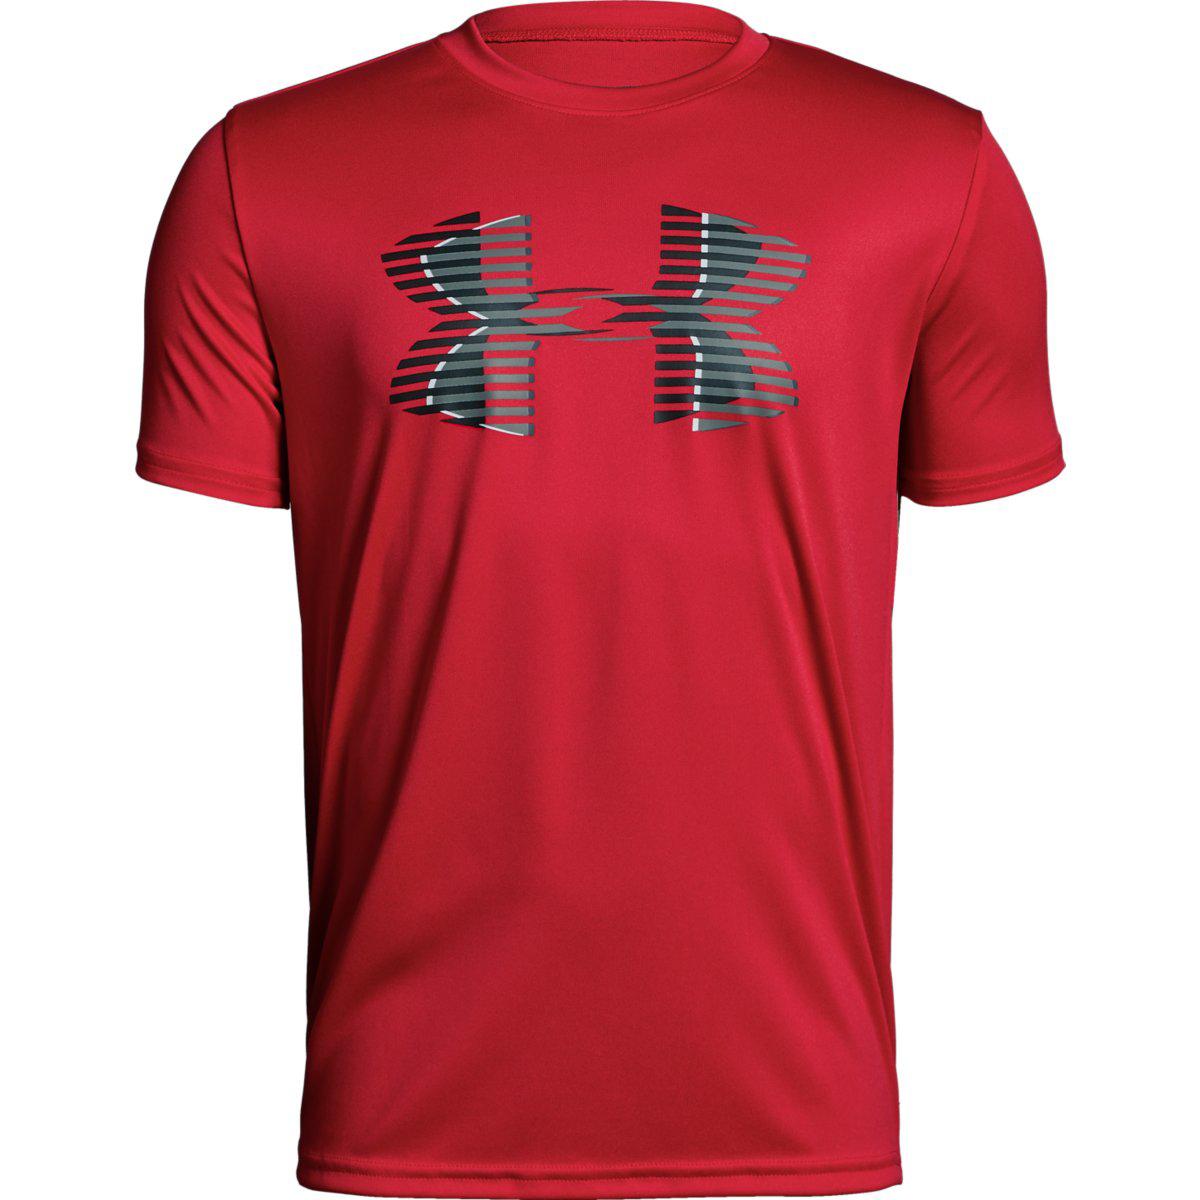 Under Armour Big Boys' Ua Tech Big Logo Solid Short-Sleeve Tee - Red, M